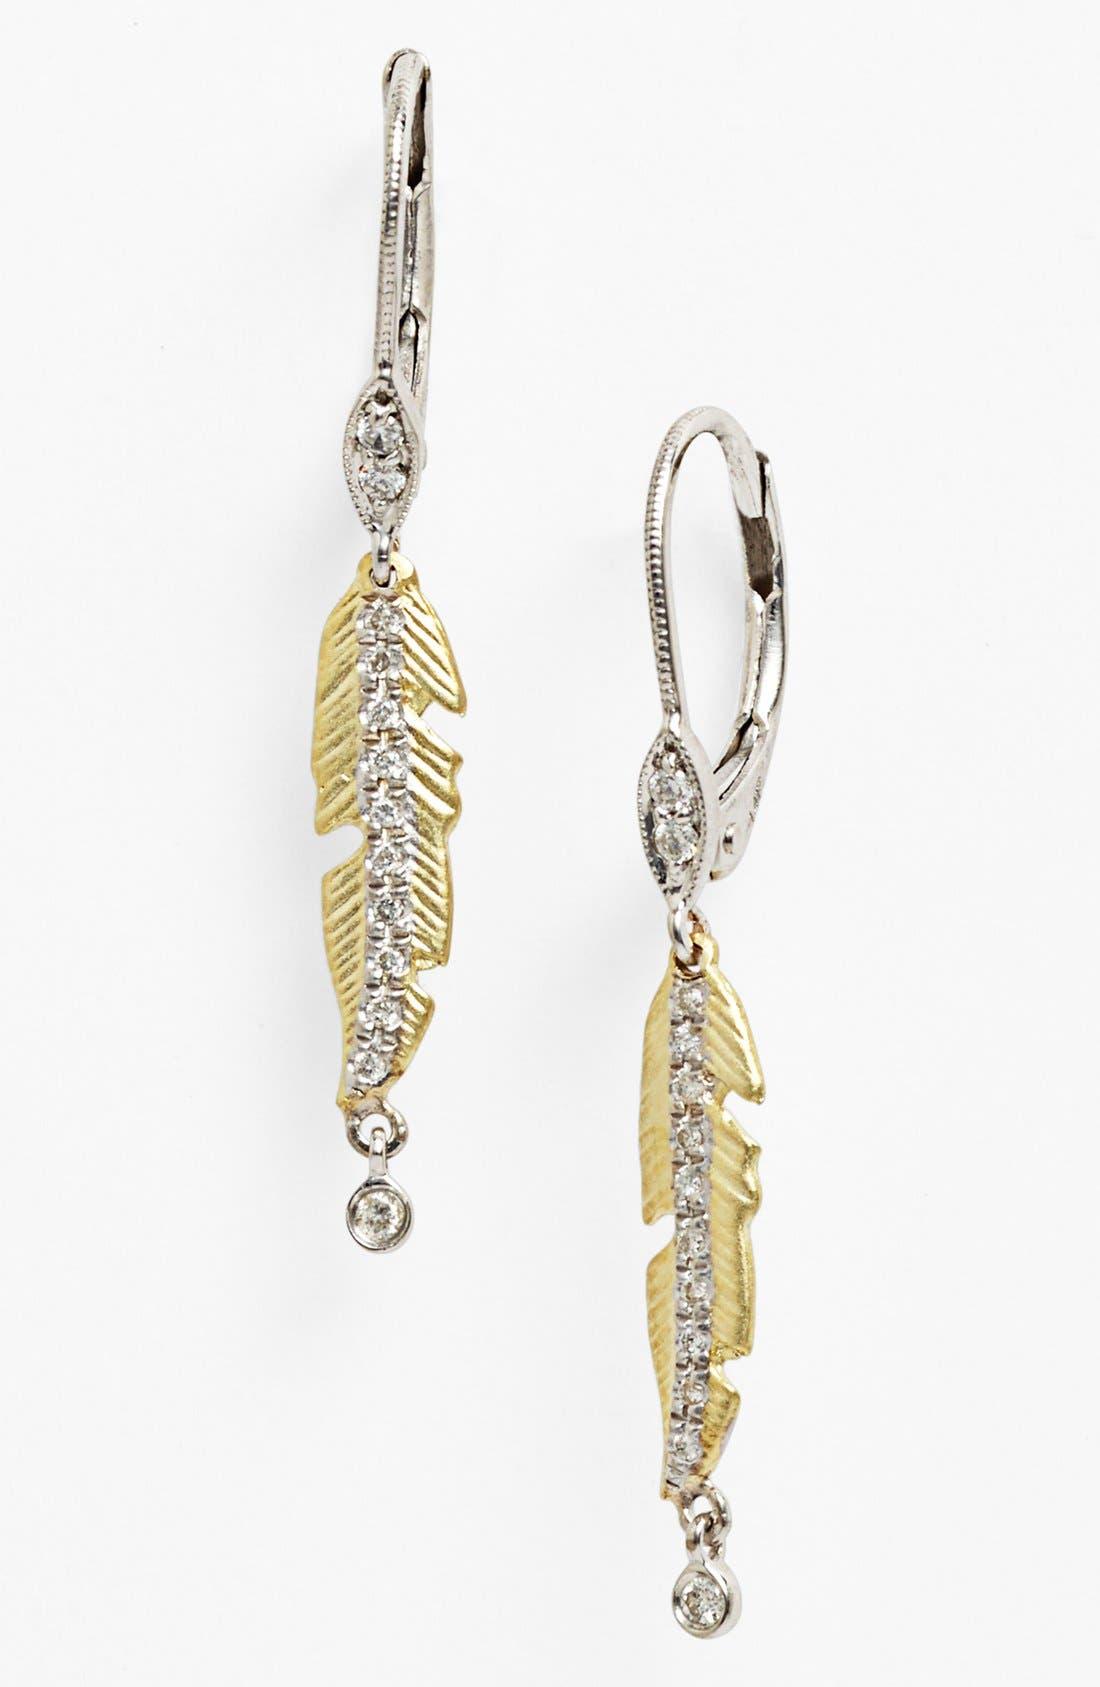 Alternate Image 1 Selected - MeiraT 'Charmed' Diamond Leaf Linear Earrings